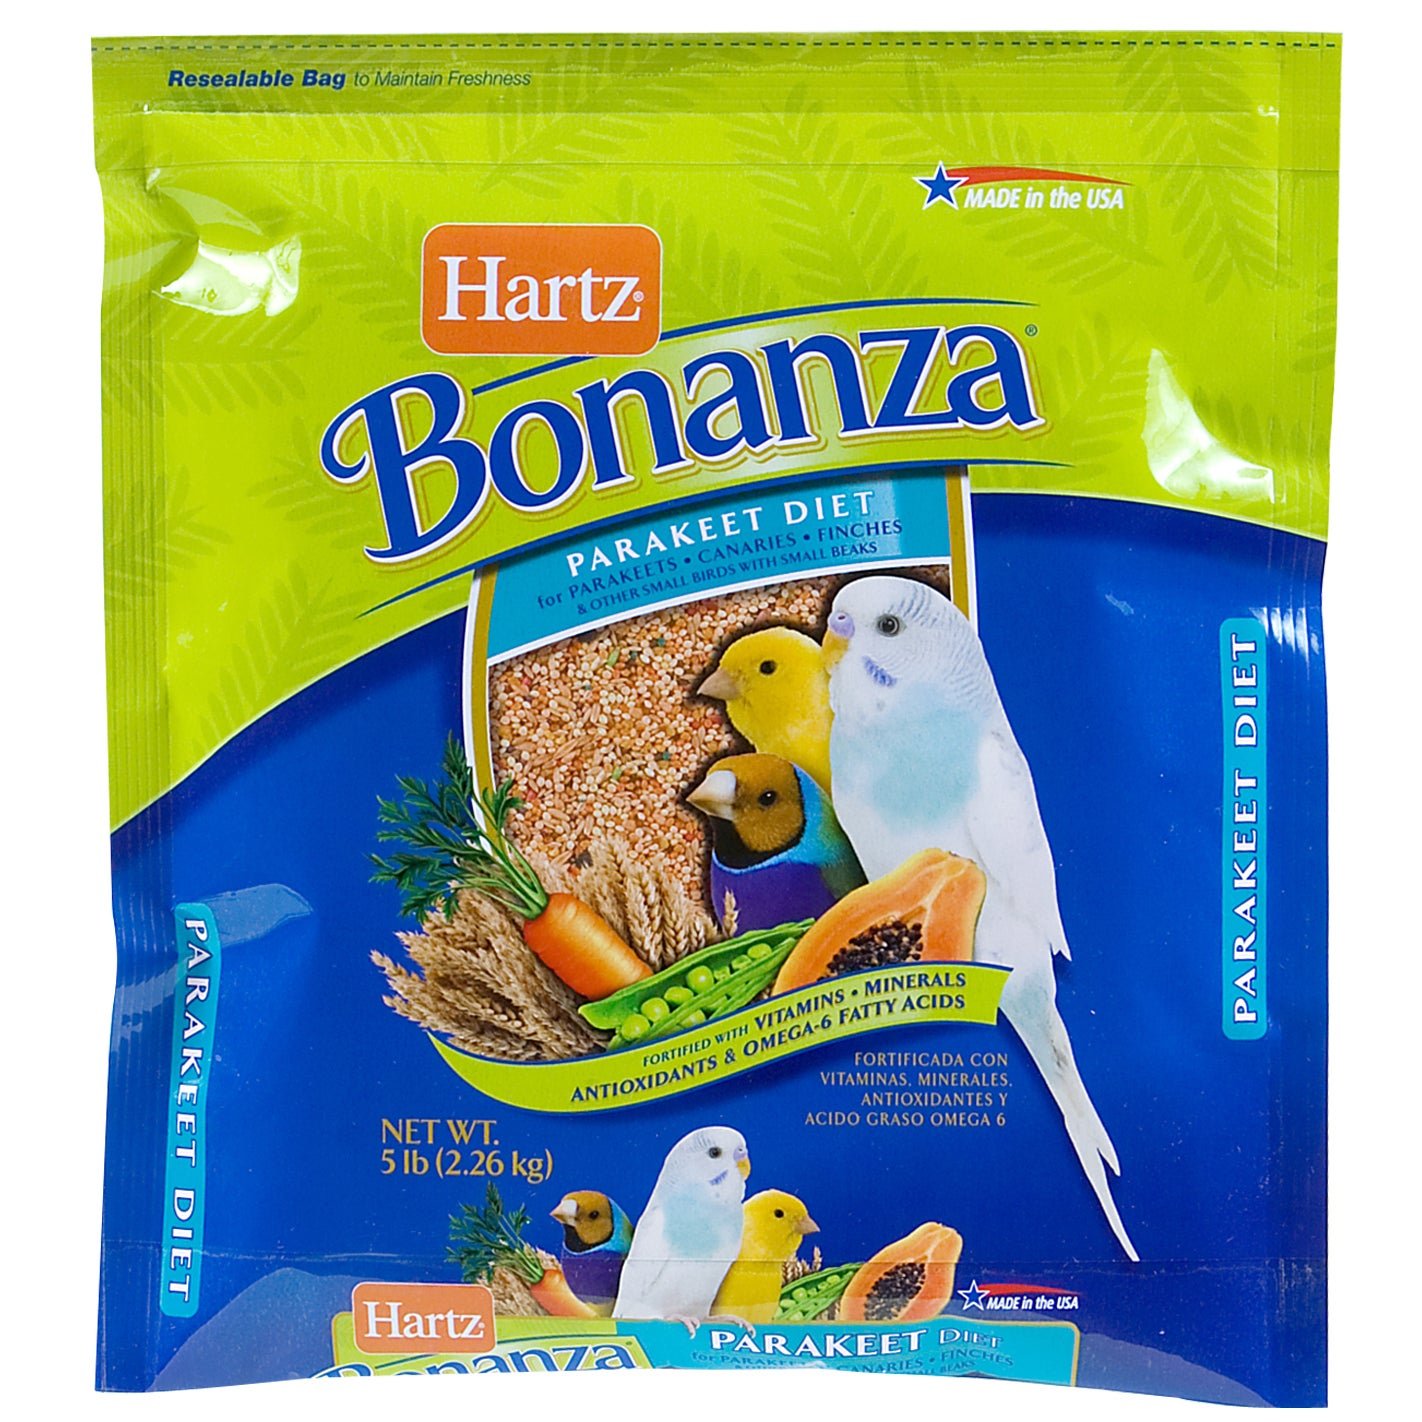 Hartz 4 Lb Nutrition Bonanza Parakeet Gourmet Diet (4 LB)